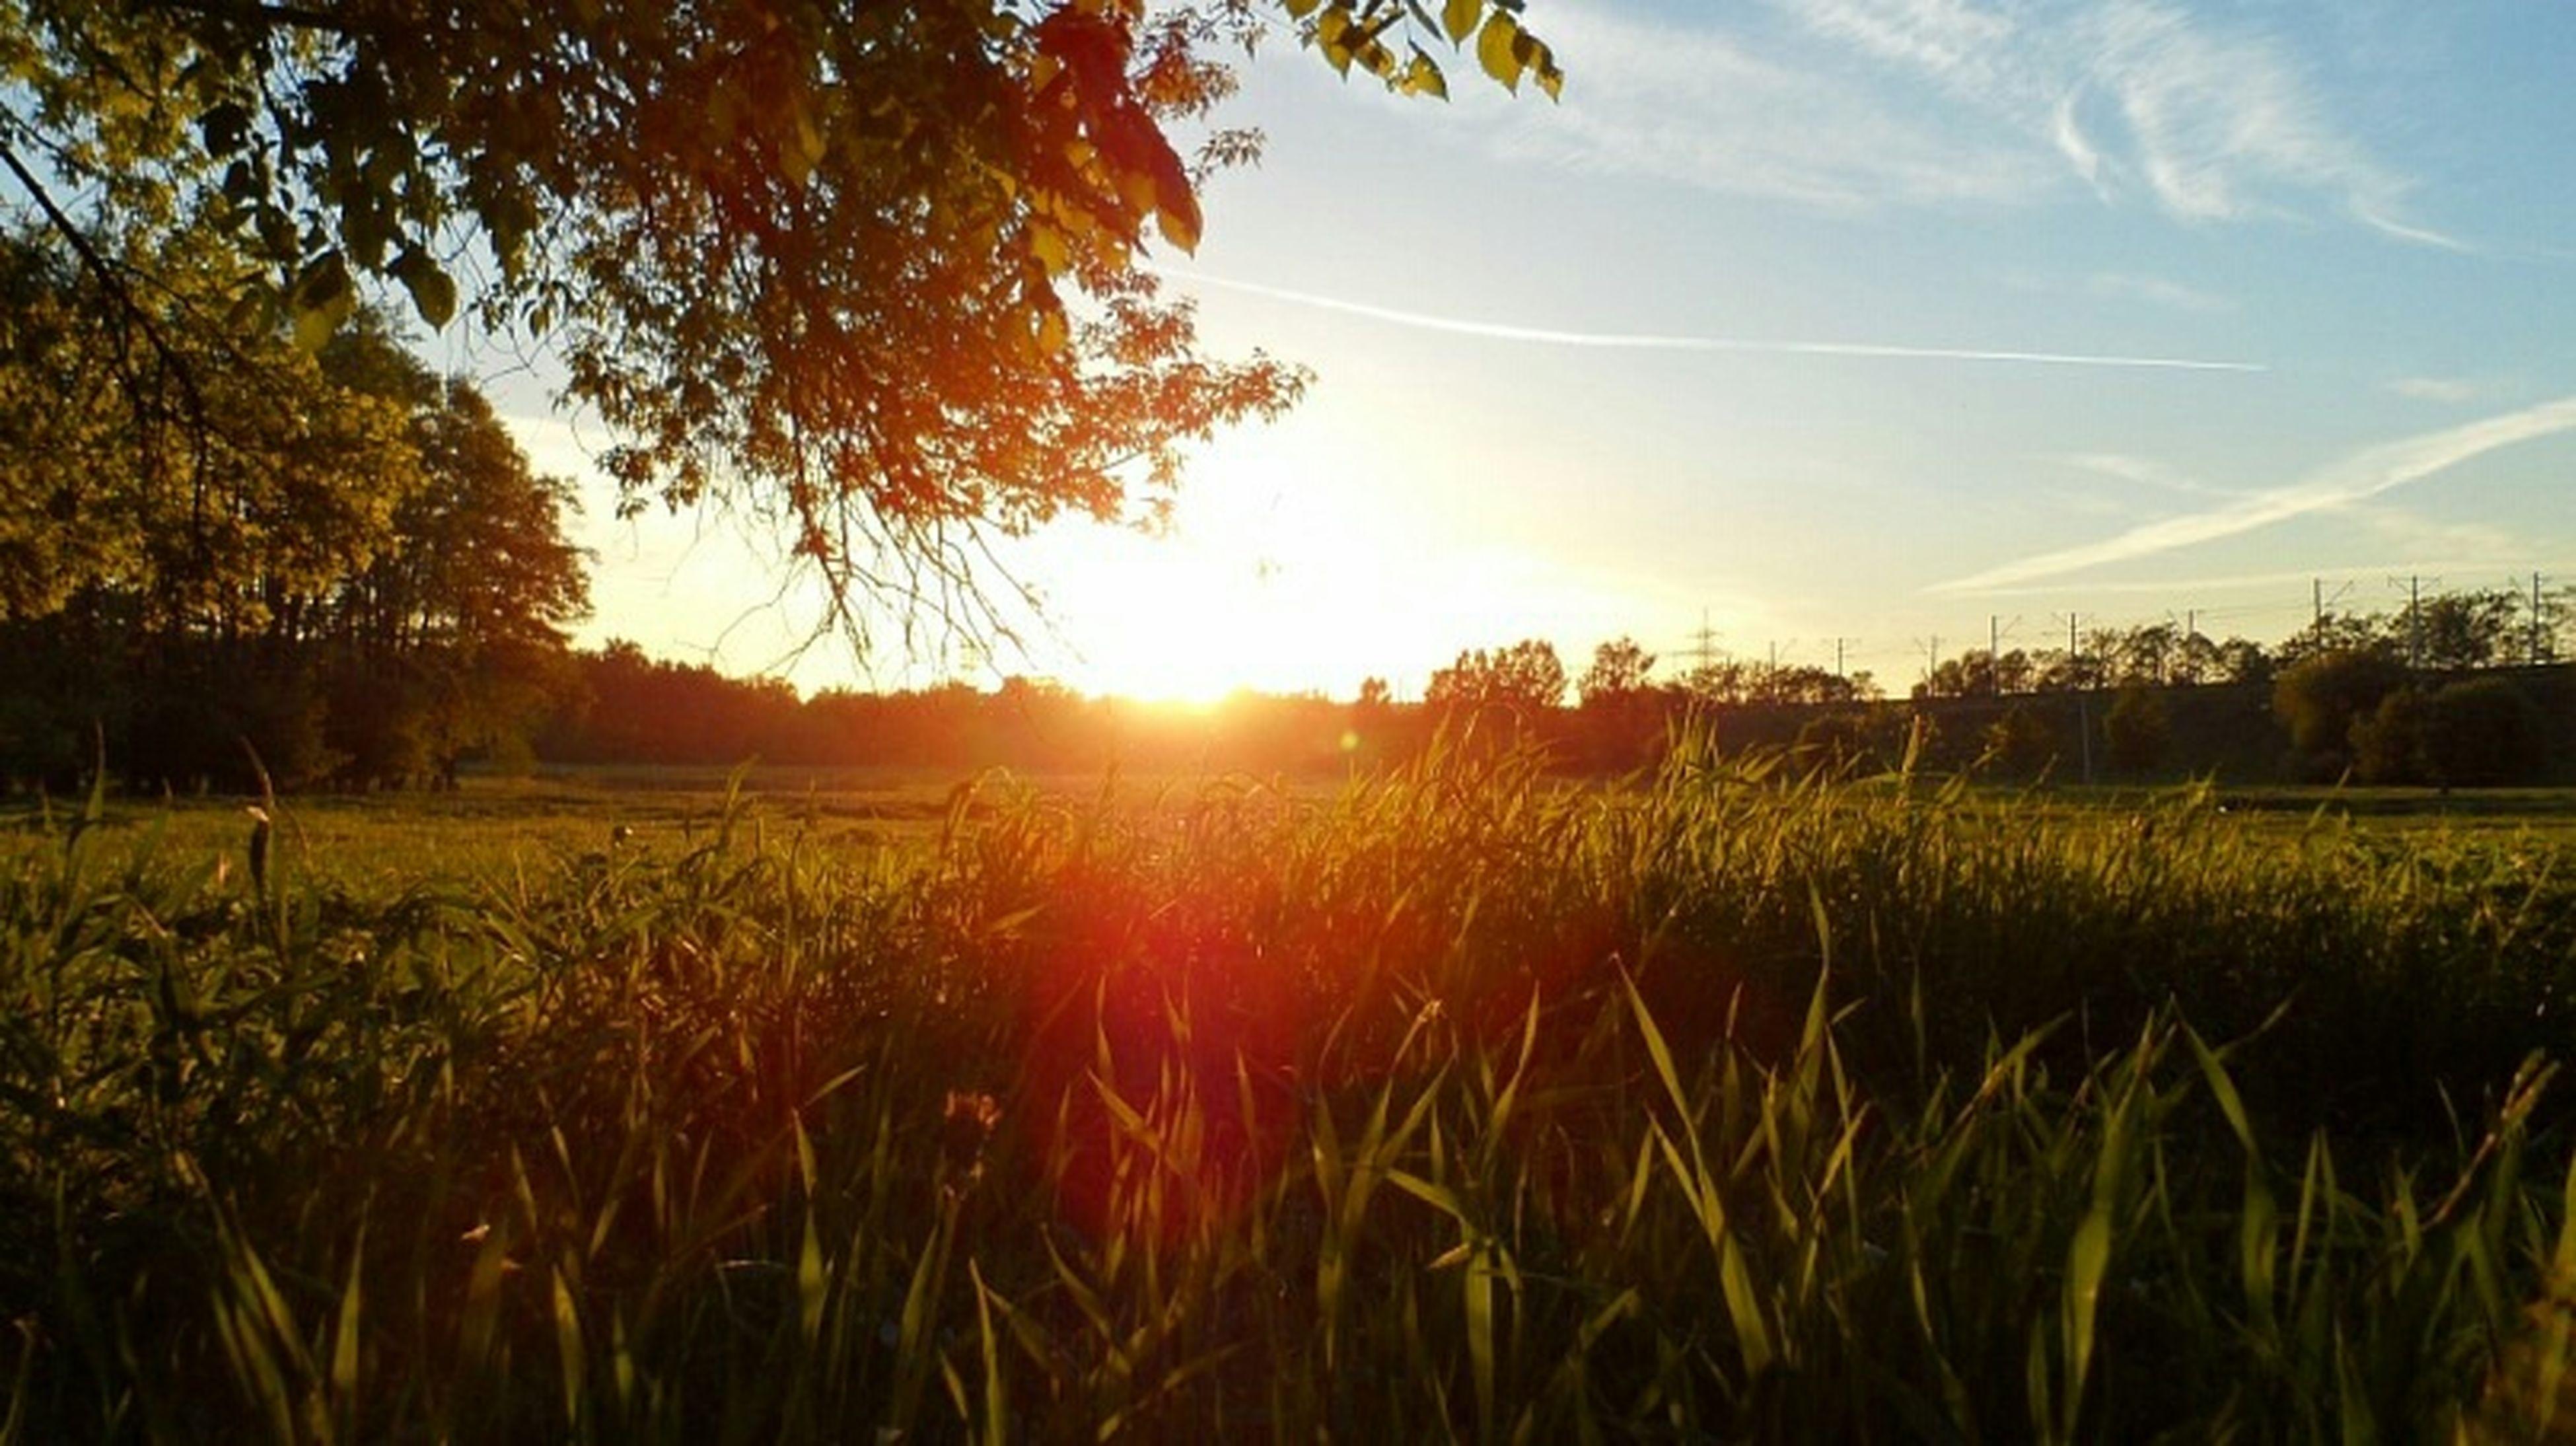 sunset, sun, field, grass, tranquil scene, landscape, tranquility, growth, beauty in nature, scenics, nature, sky, sunlight, rural scene, plant, tree, sunbeam, orange color, idyllic, lens flare